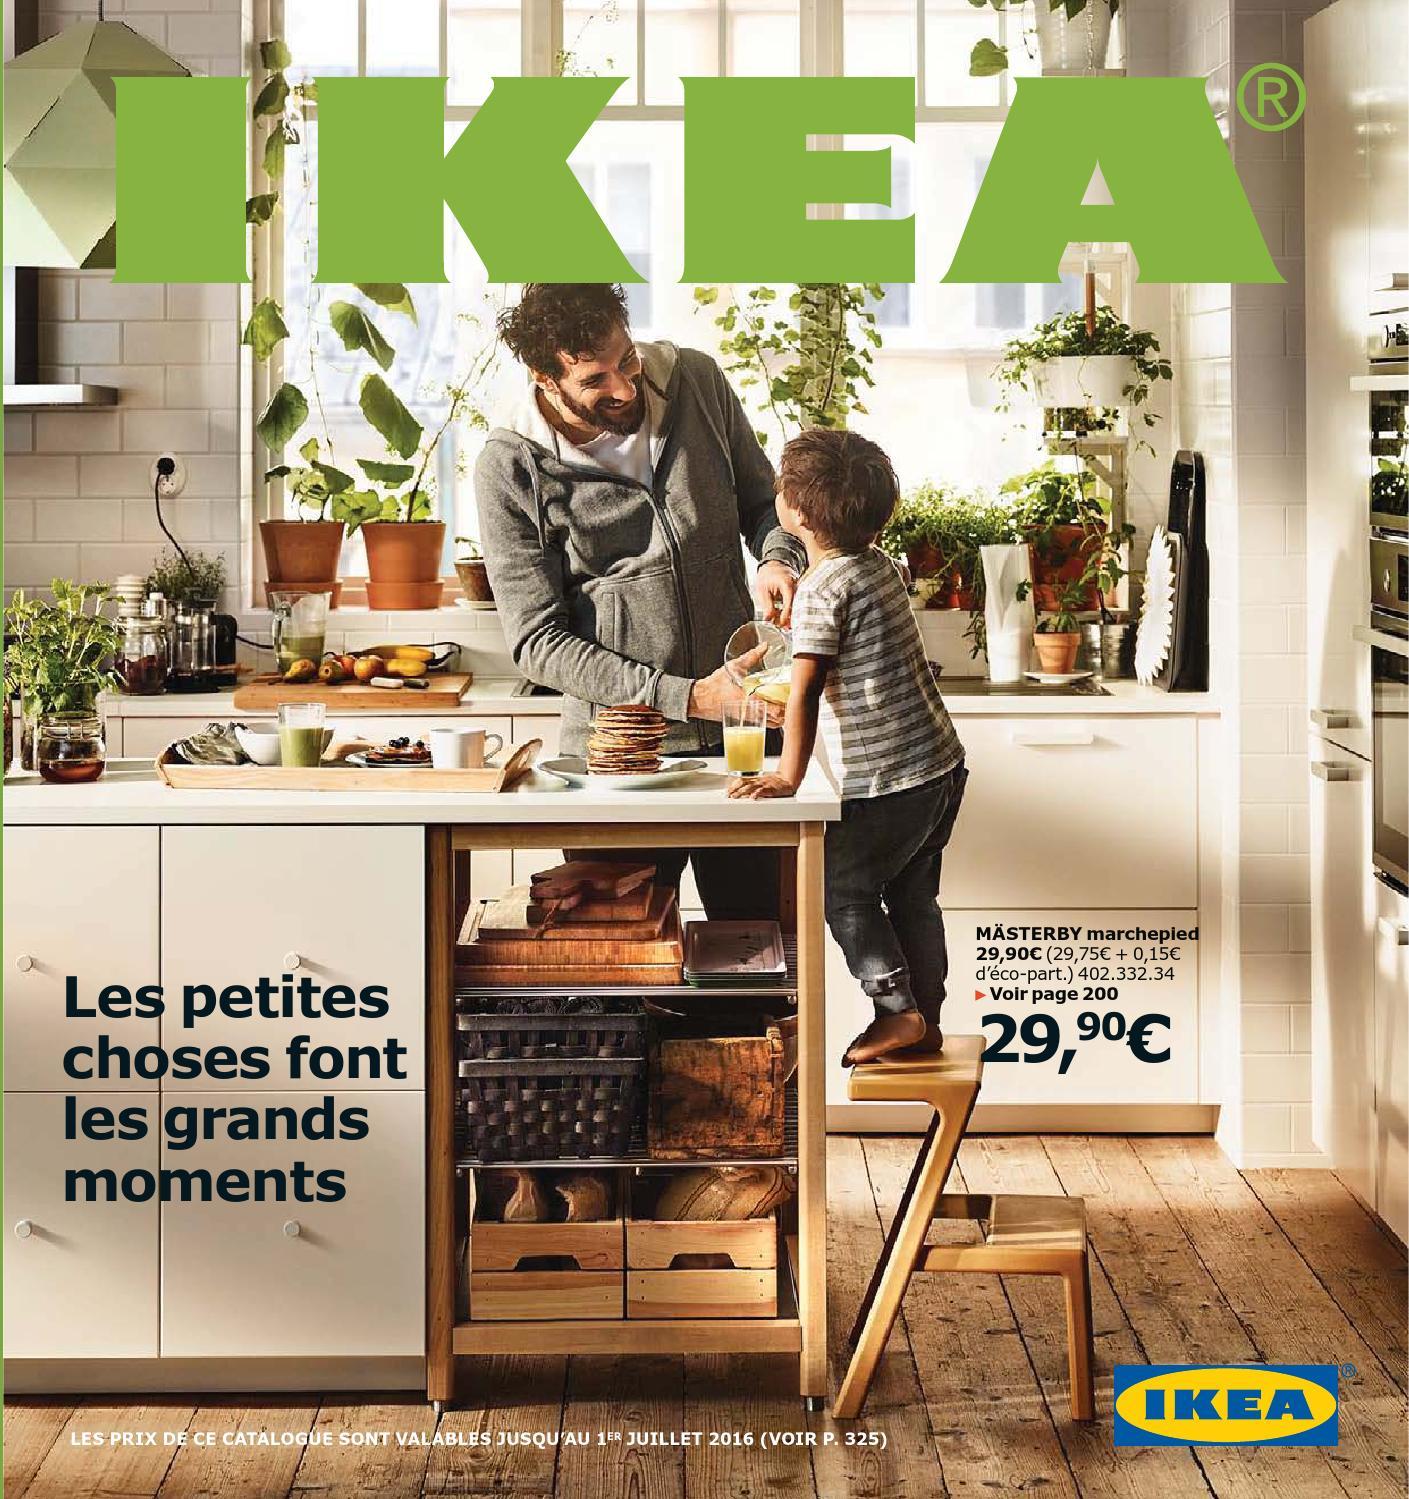 Ikea Catalogue 2016 By Margot Ziegler Issuu